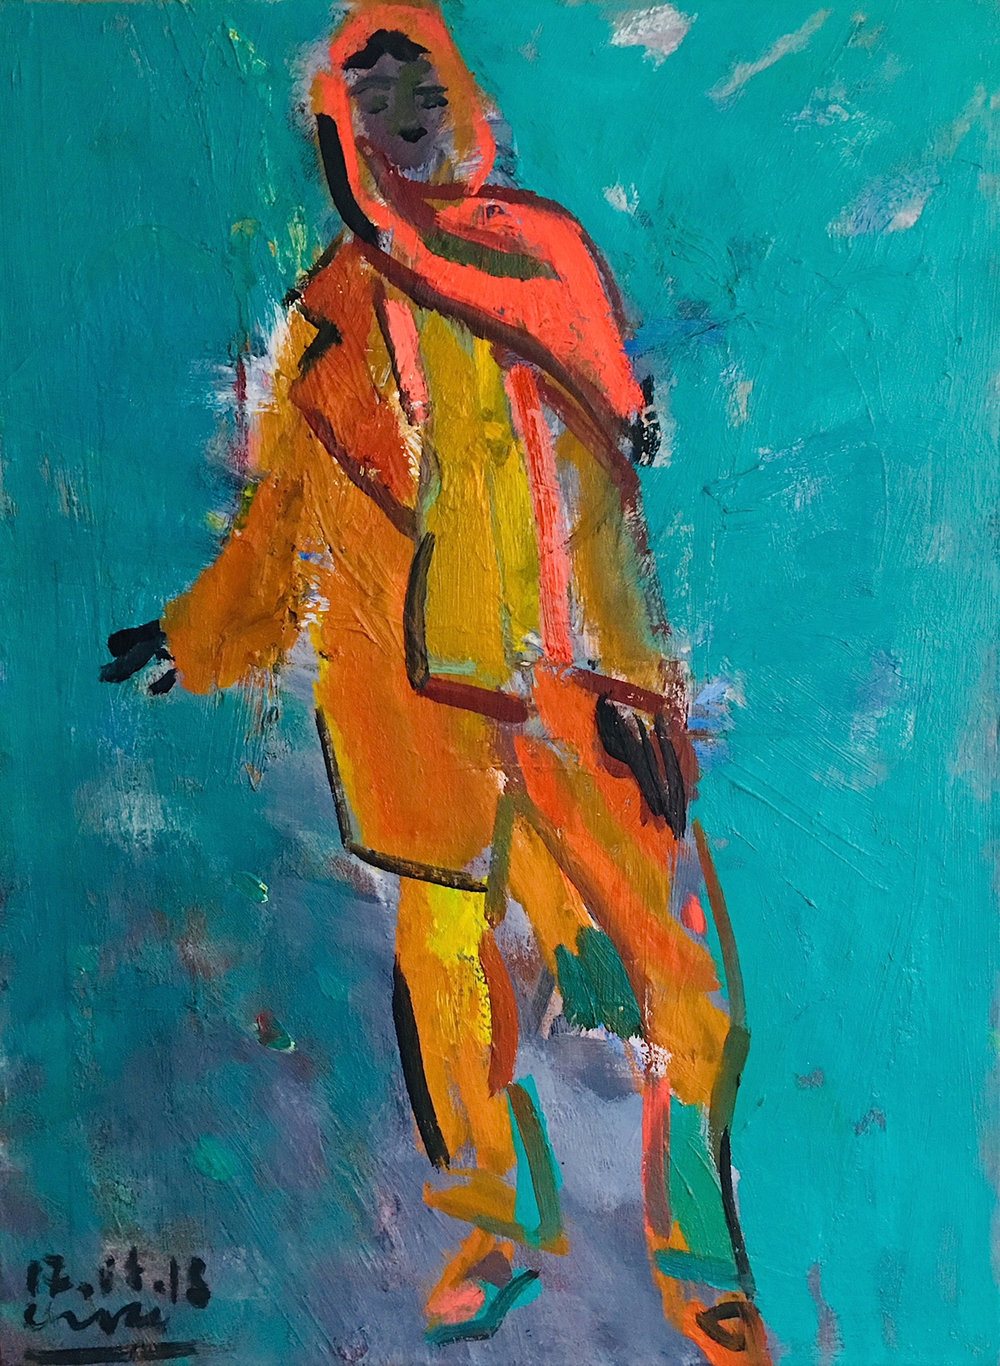 Title: Mimi in her Silk Scarf  Size: 61 x 46 cm  Medium: Oil on canvas  Price: £1550